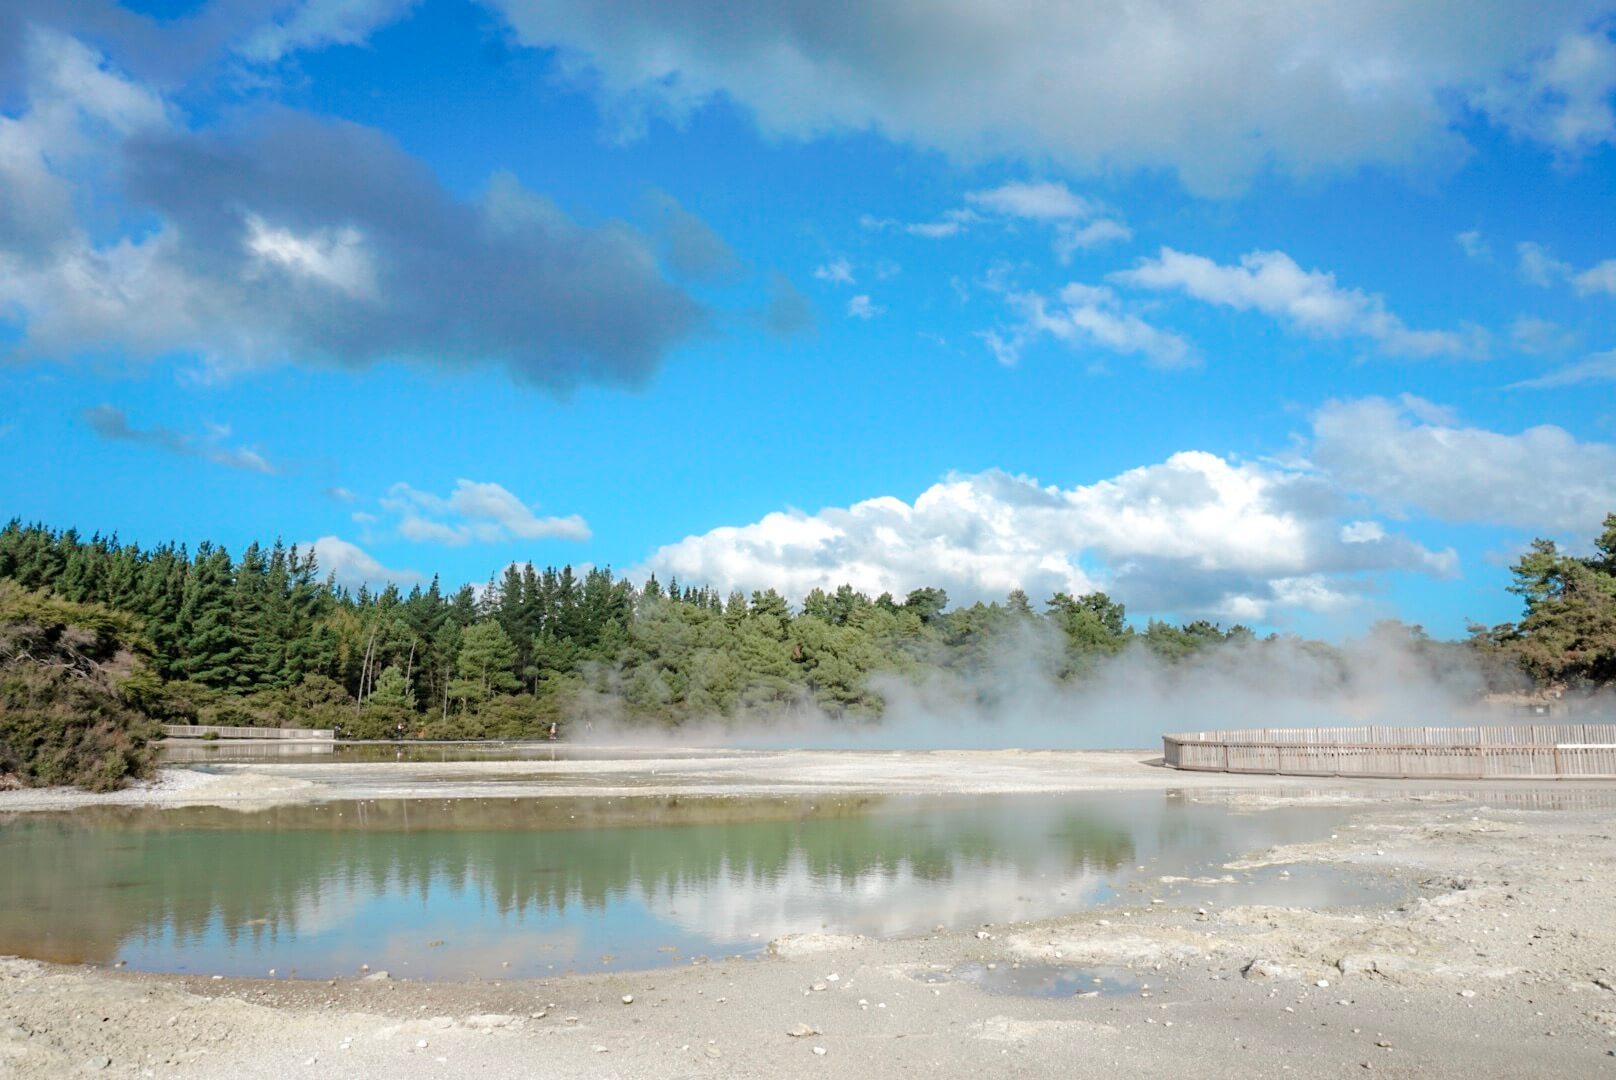 piscine géothermique champagne pool de wai-o-tapu